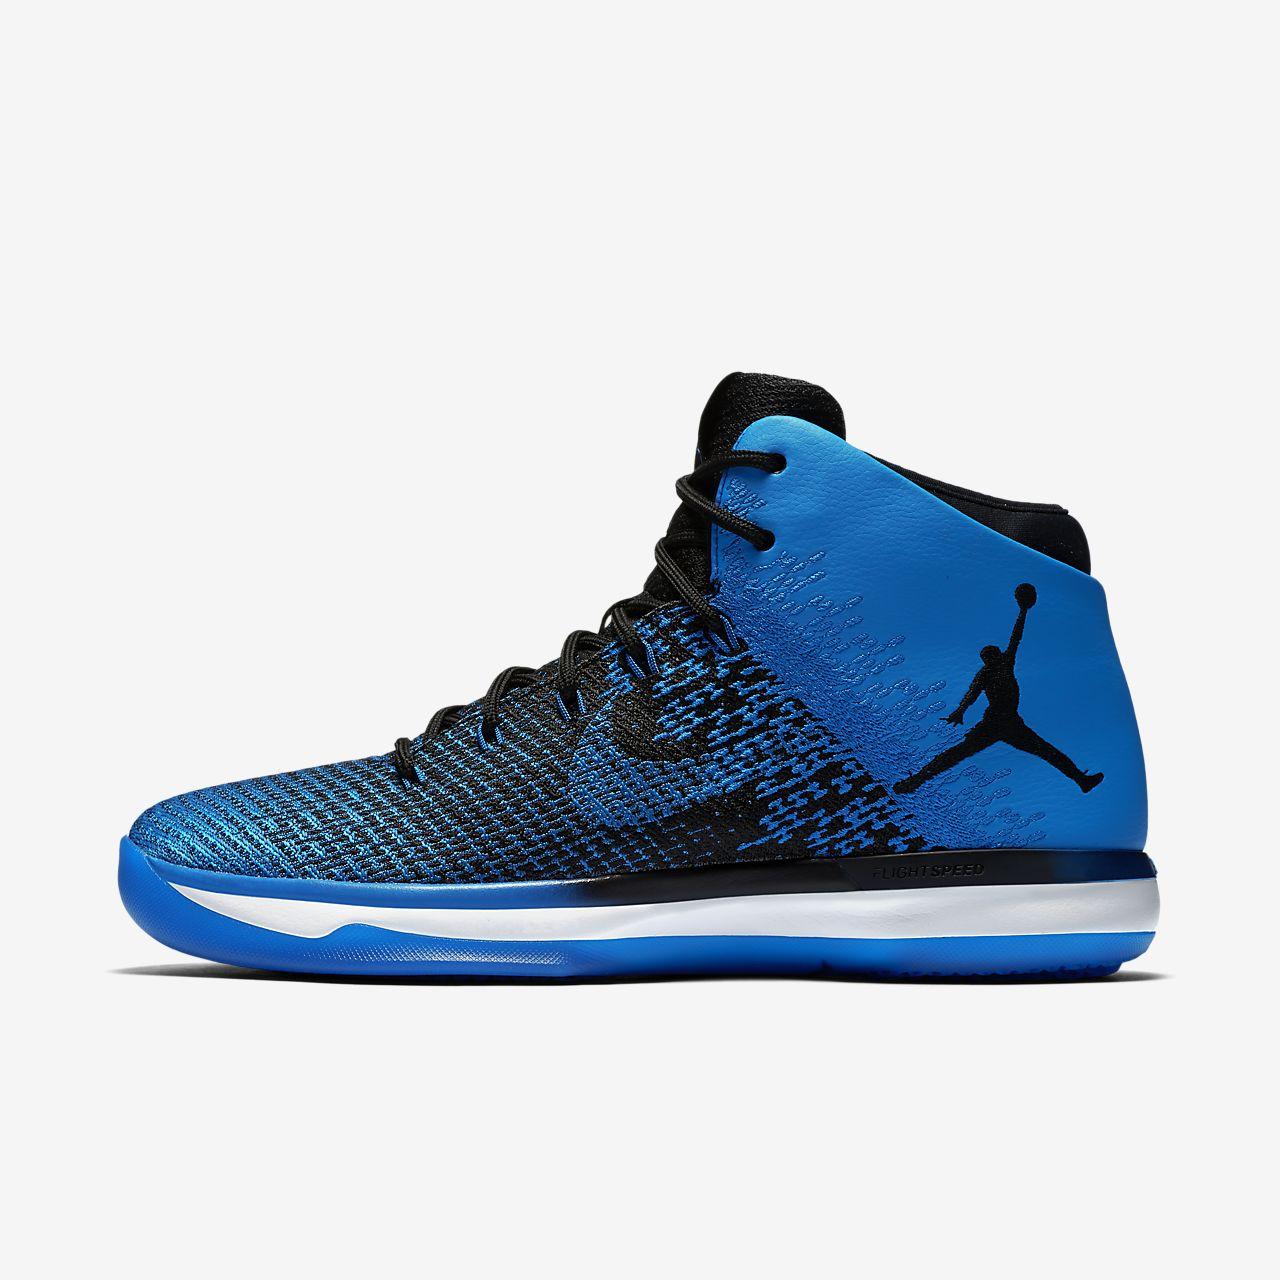 Chaussure de basketball Air Jordan XXXI pour Homme